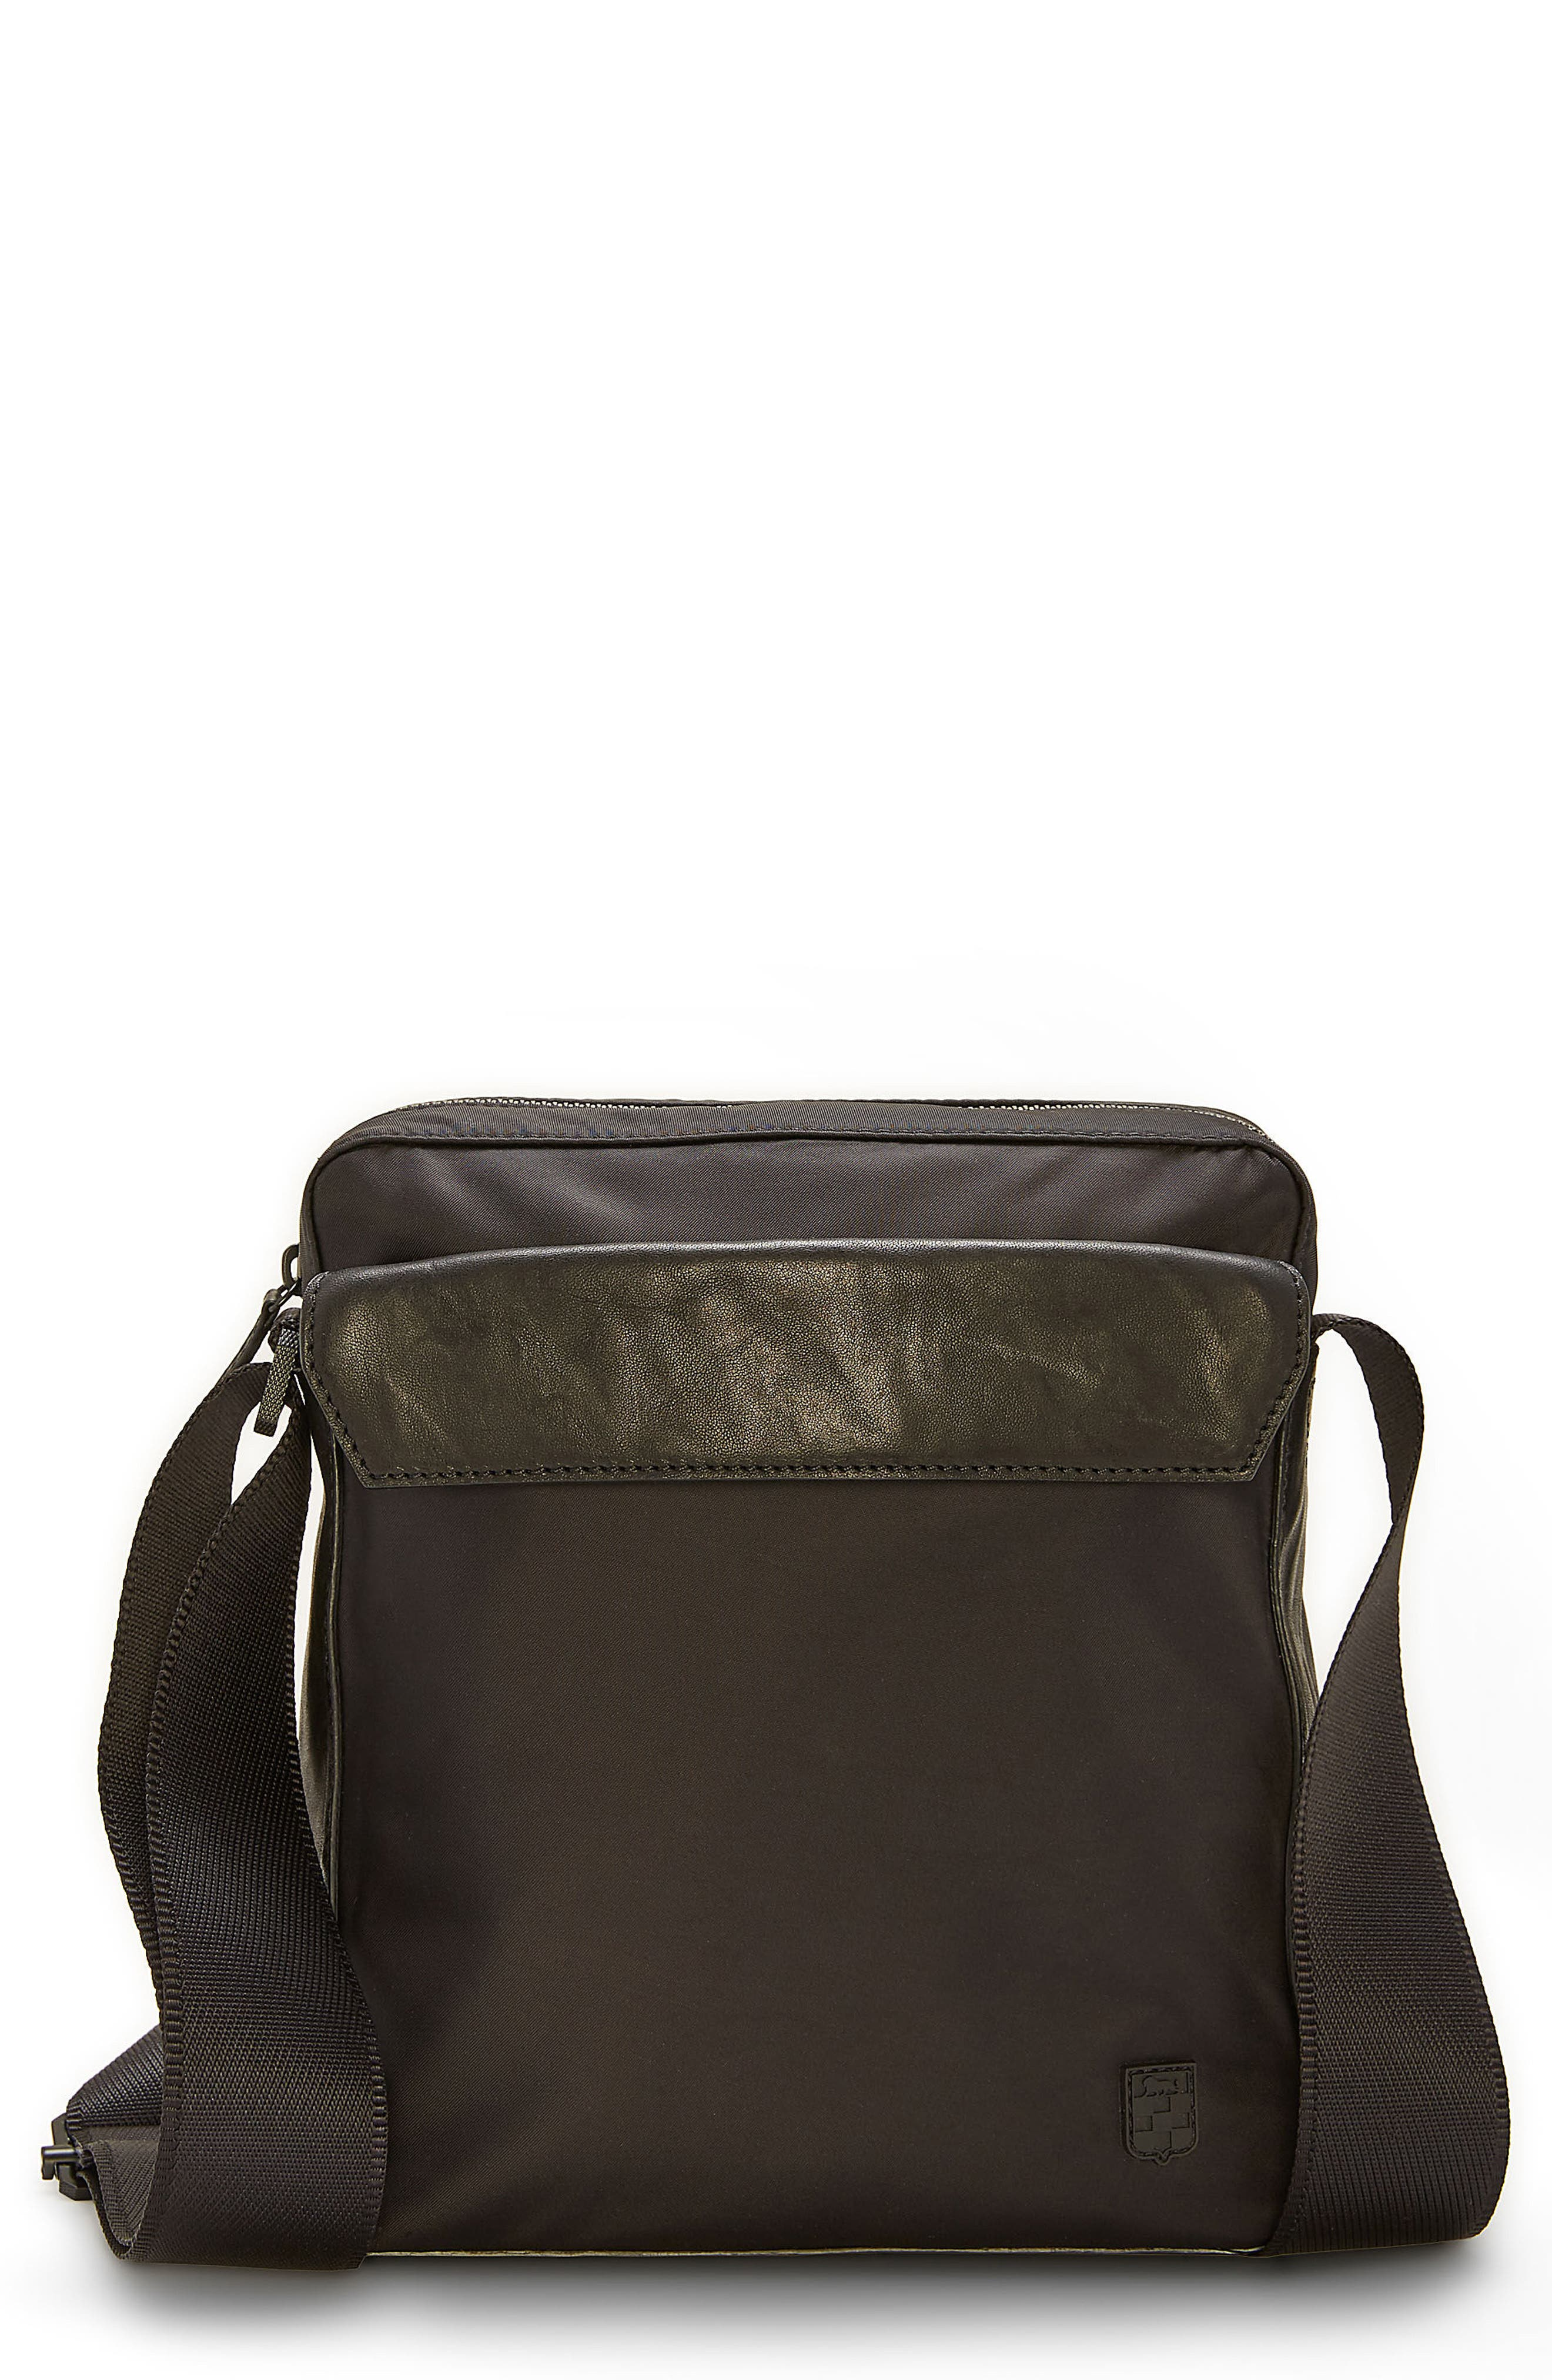 Basin Crossbody Bag,                         Main,                         color,